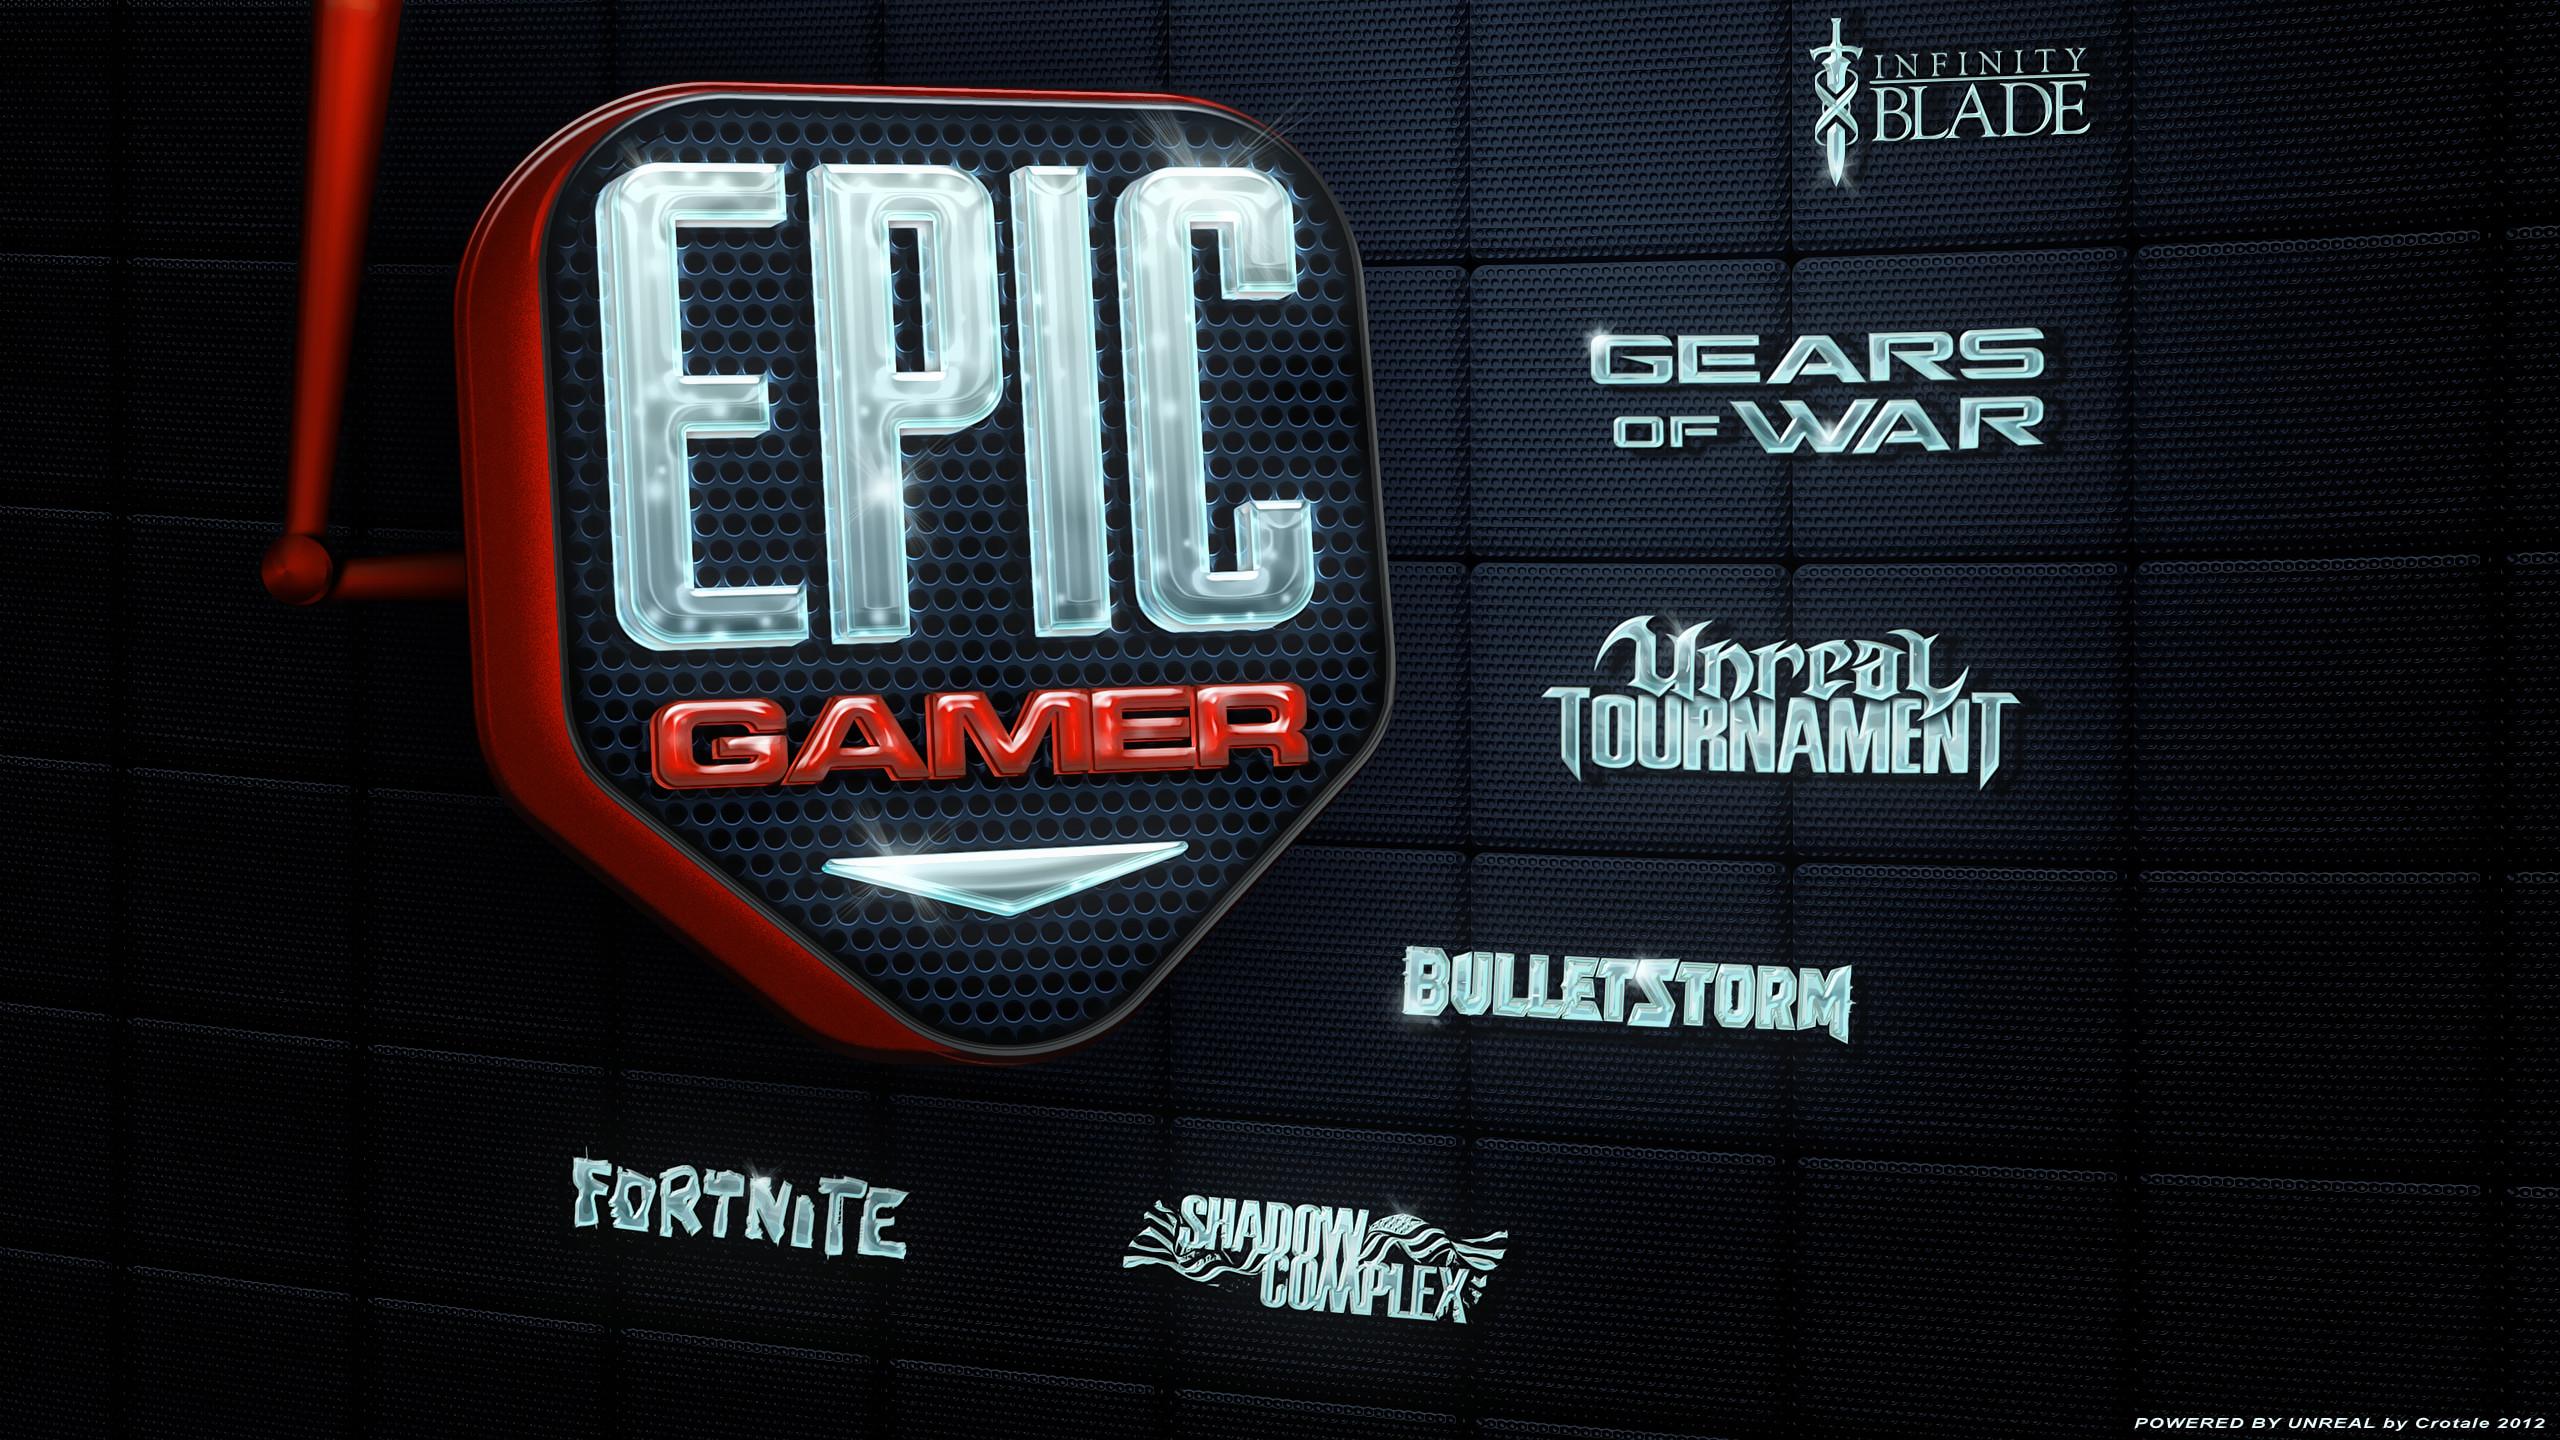 Epic Gamer Desktop Wallpaper by Crotale 2560 × 1440